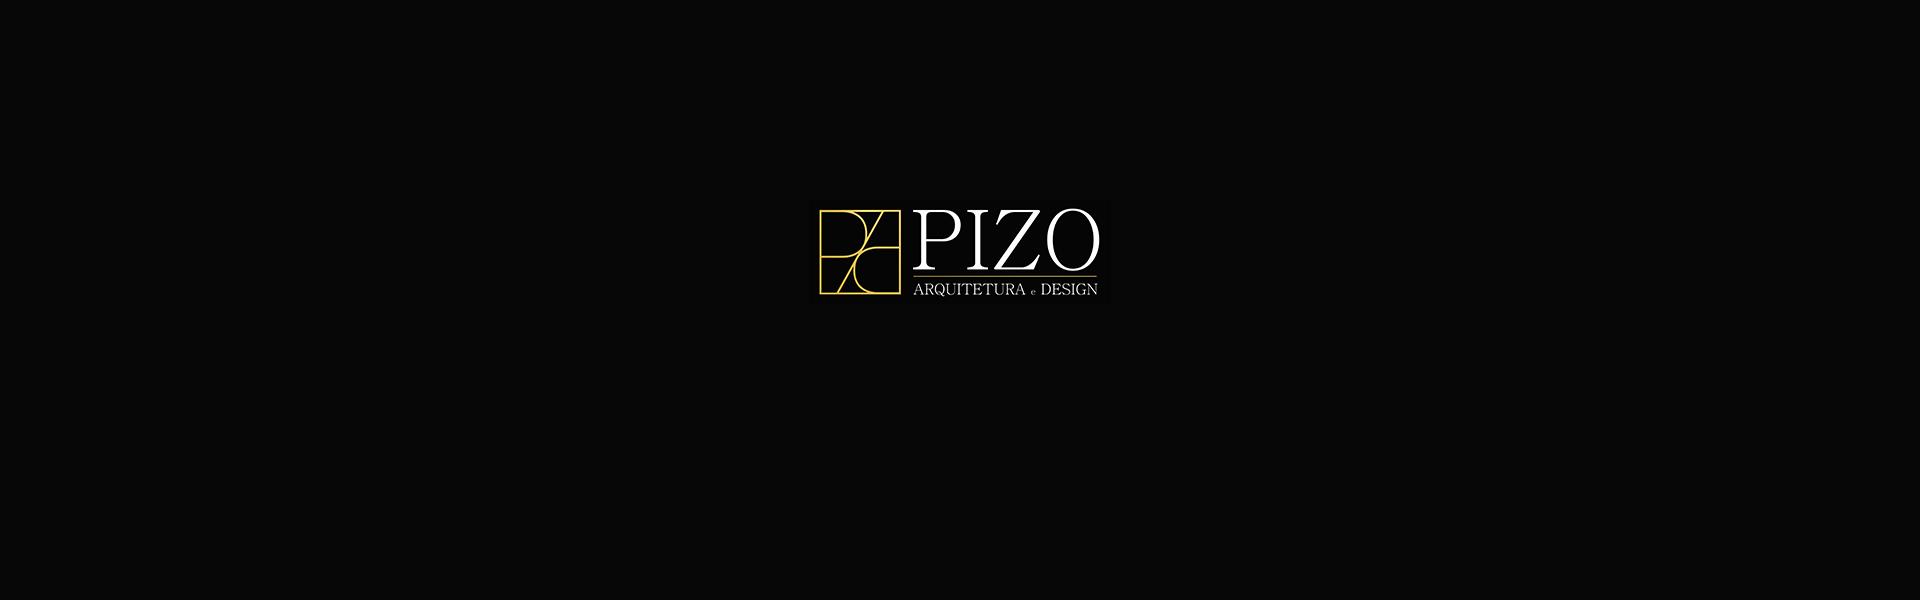 Contate Pizo | Arquitetura e Design